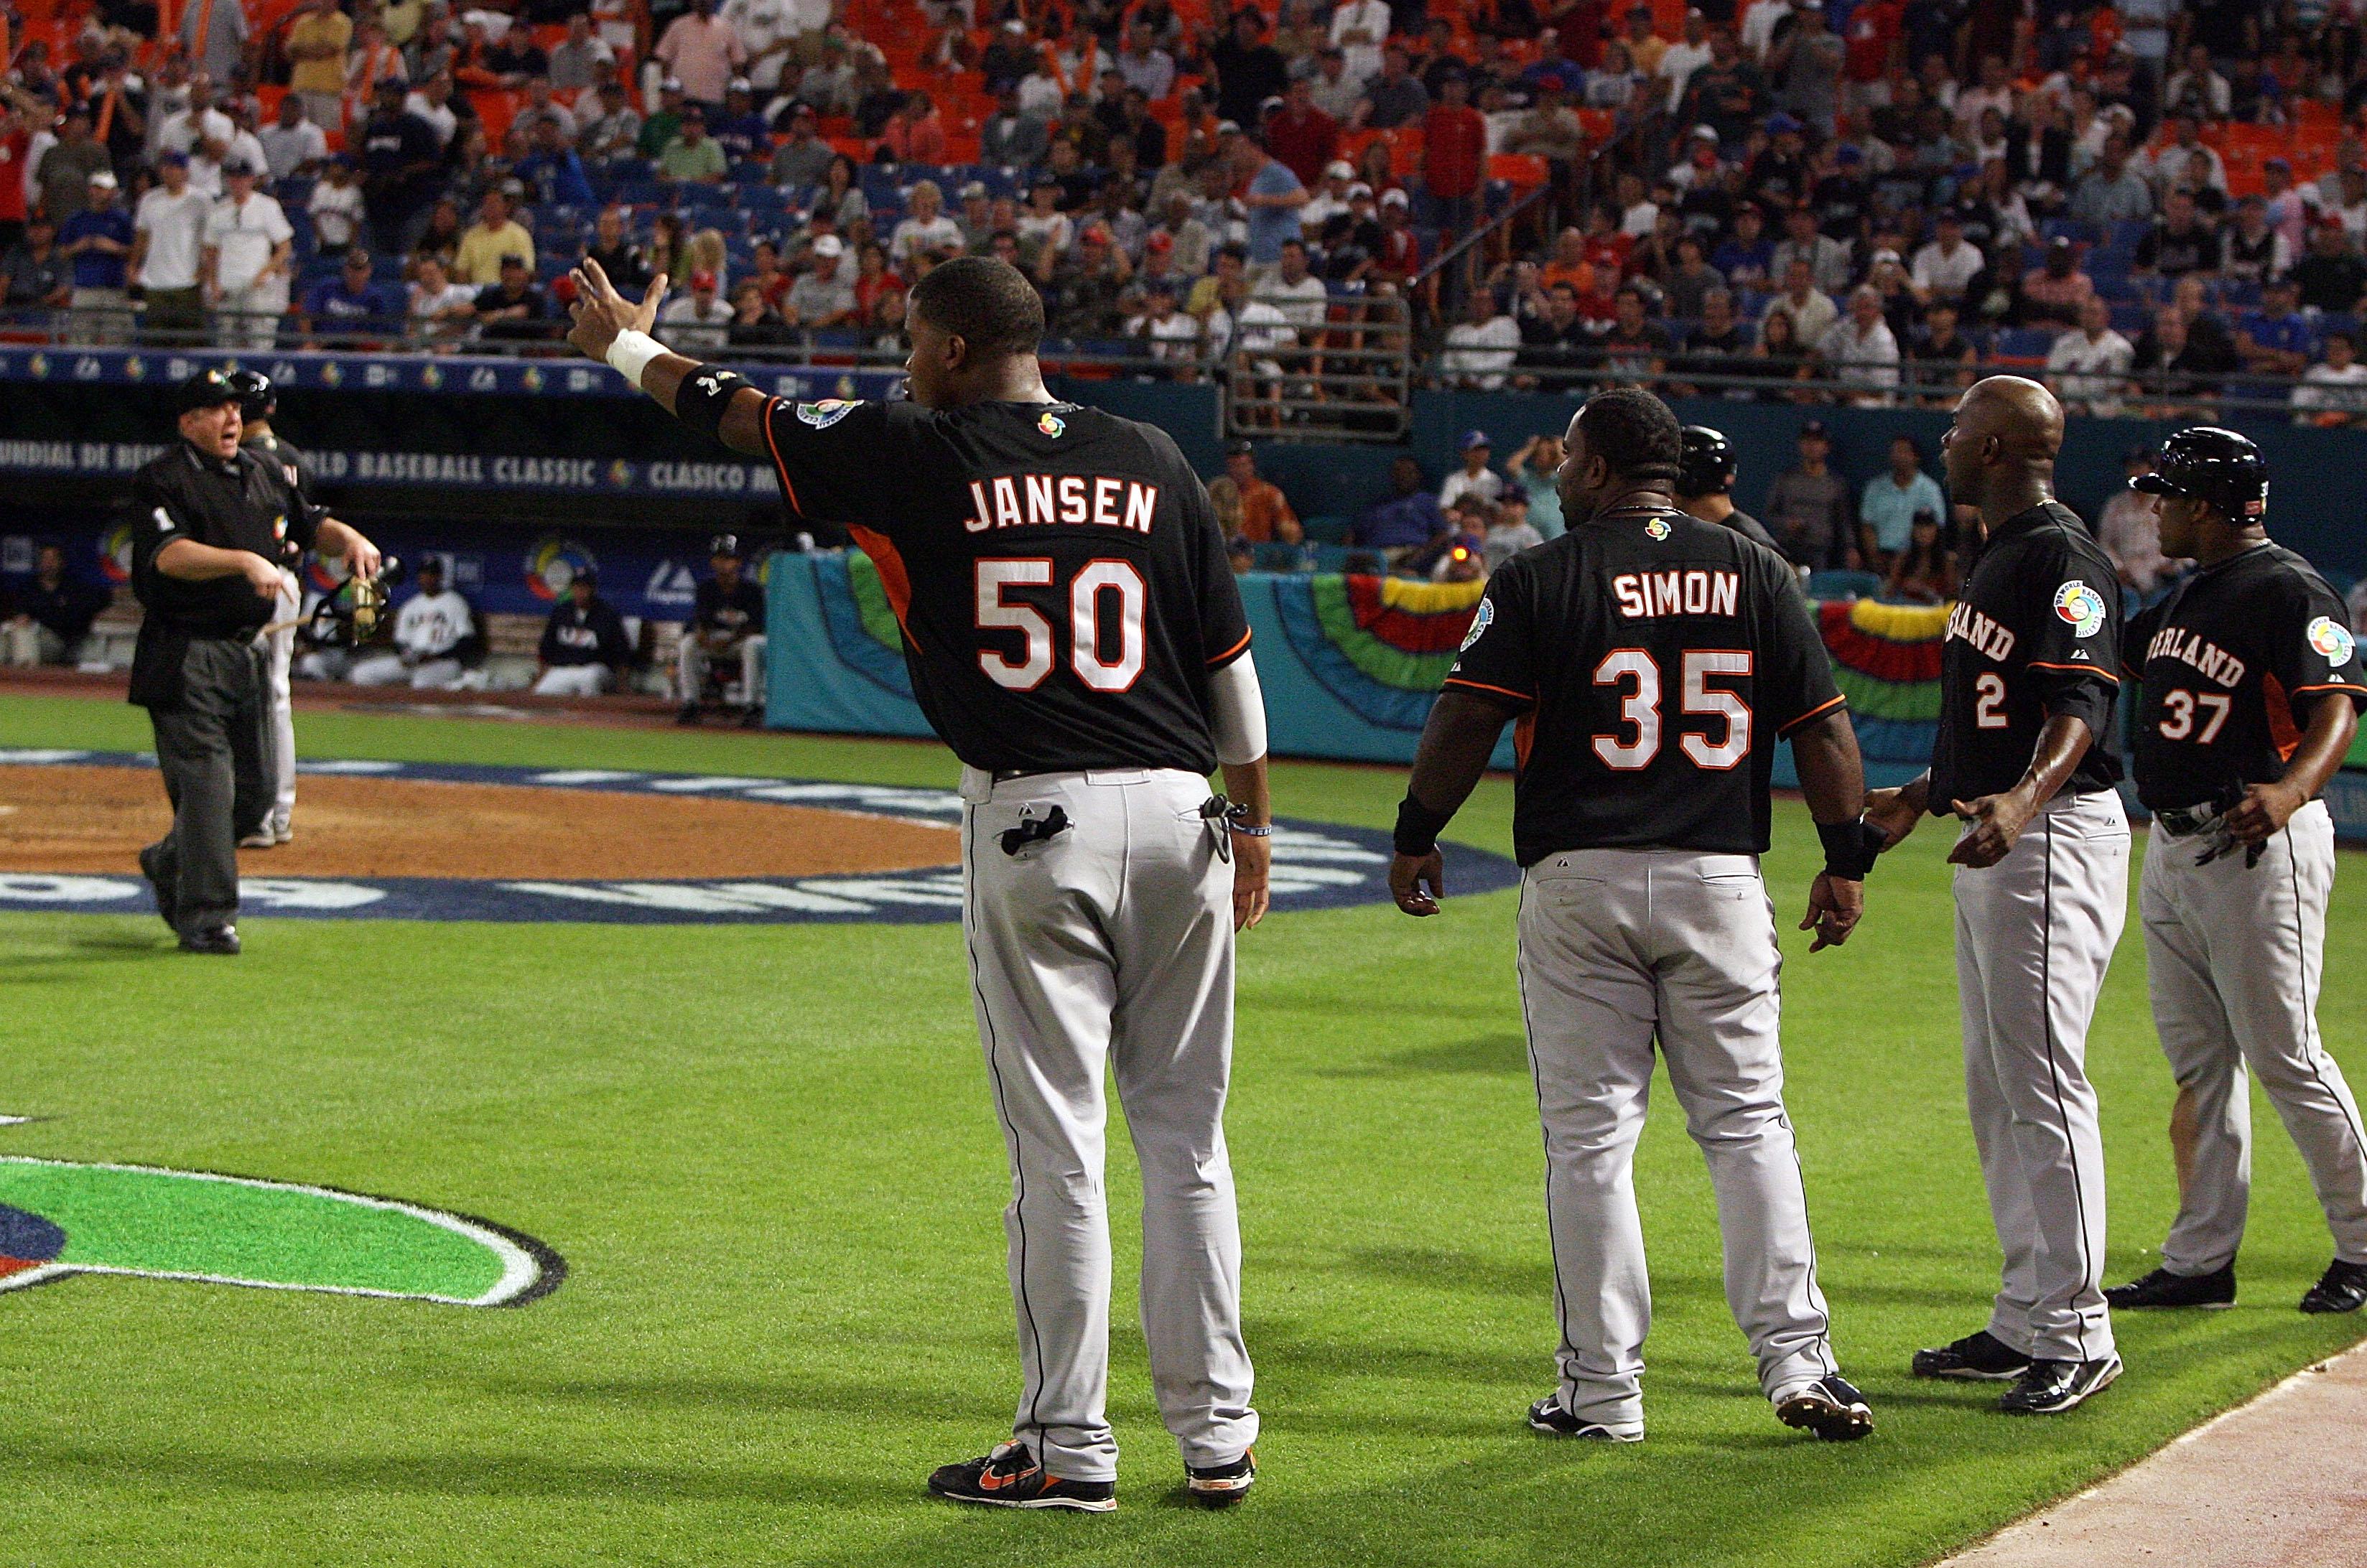 World Baseball Classic 2009 - Netherlands v USA